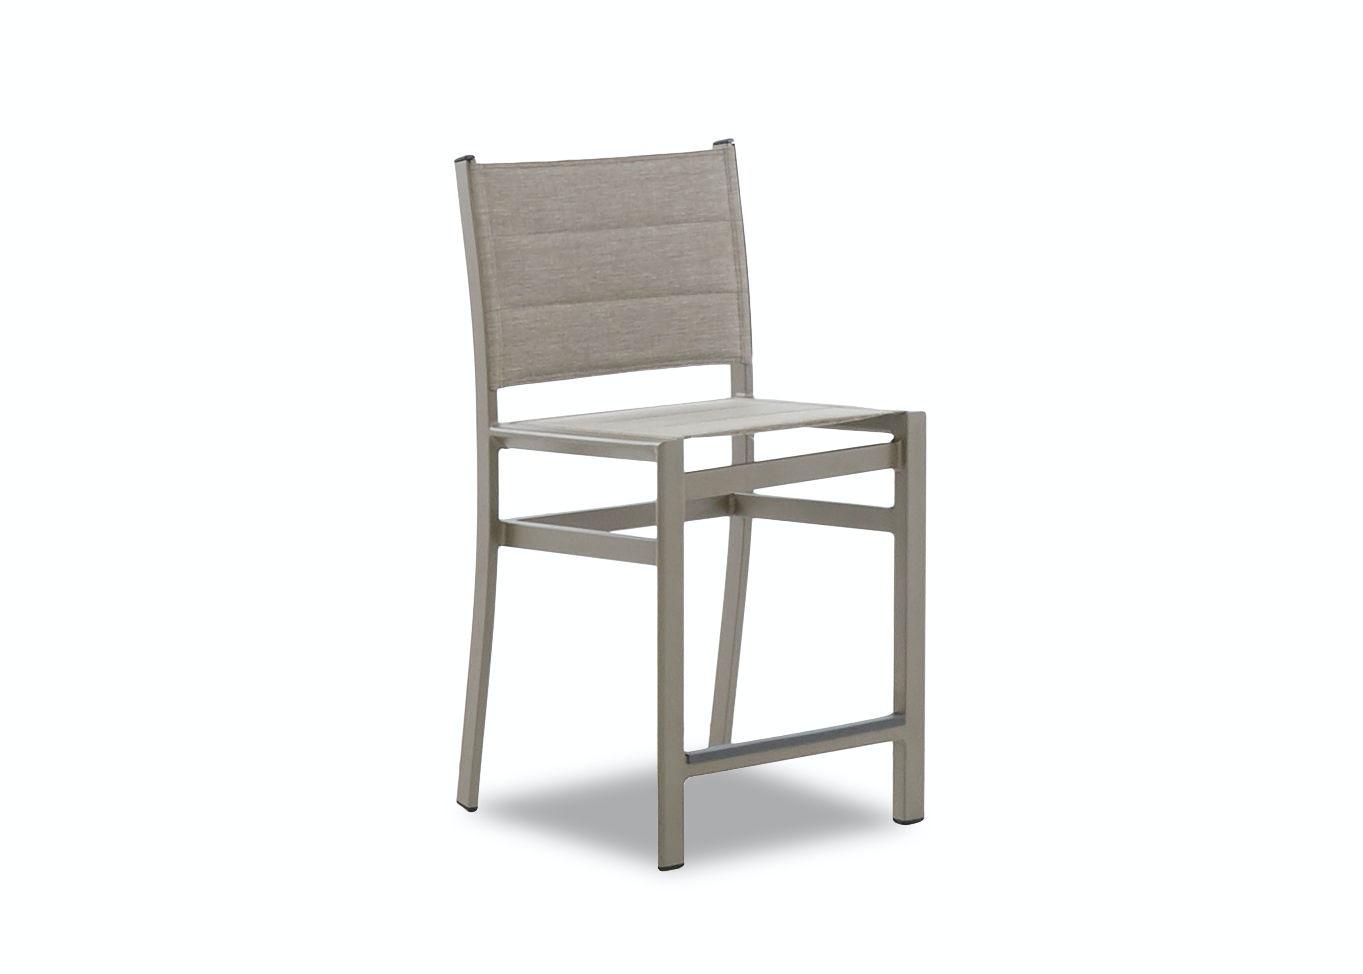 Carolina Preserves Outdoor/Patio Urban Retreat Barstool W3500 BRST At China  Towne Furniture